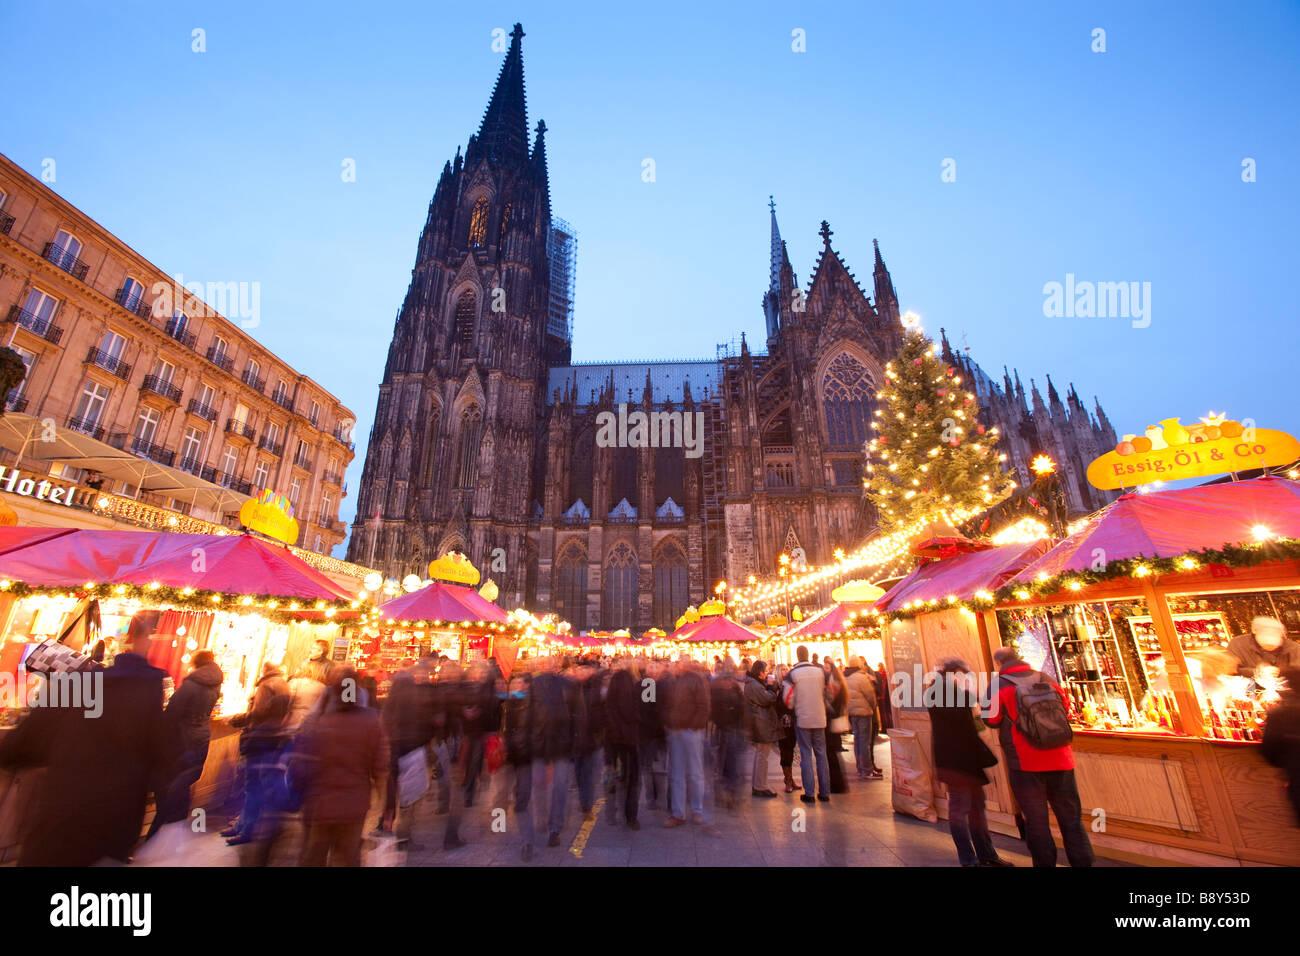 Christmas market at dusk Cologne cathedral Nordrhein Westfalen Germany - Stock Image